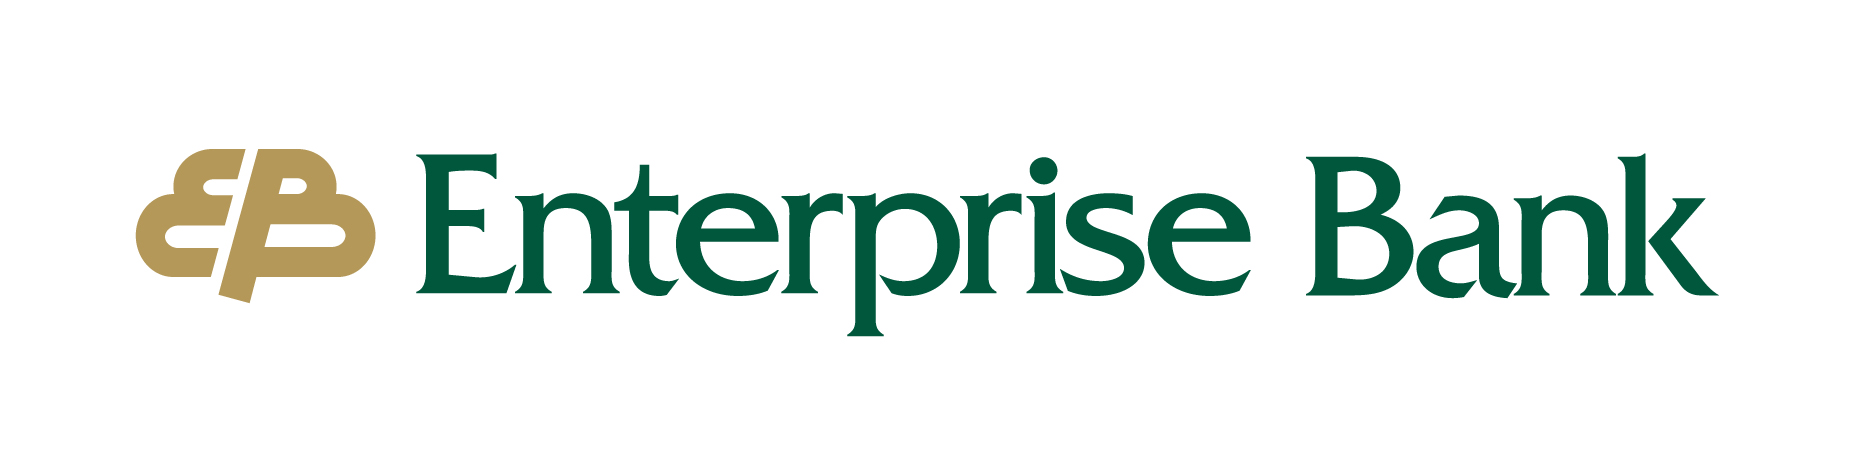 enterprisebanks.jpg